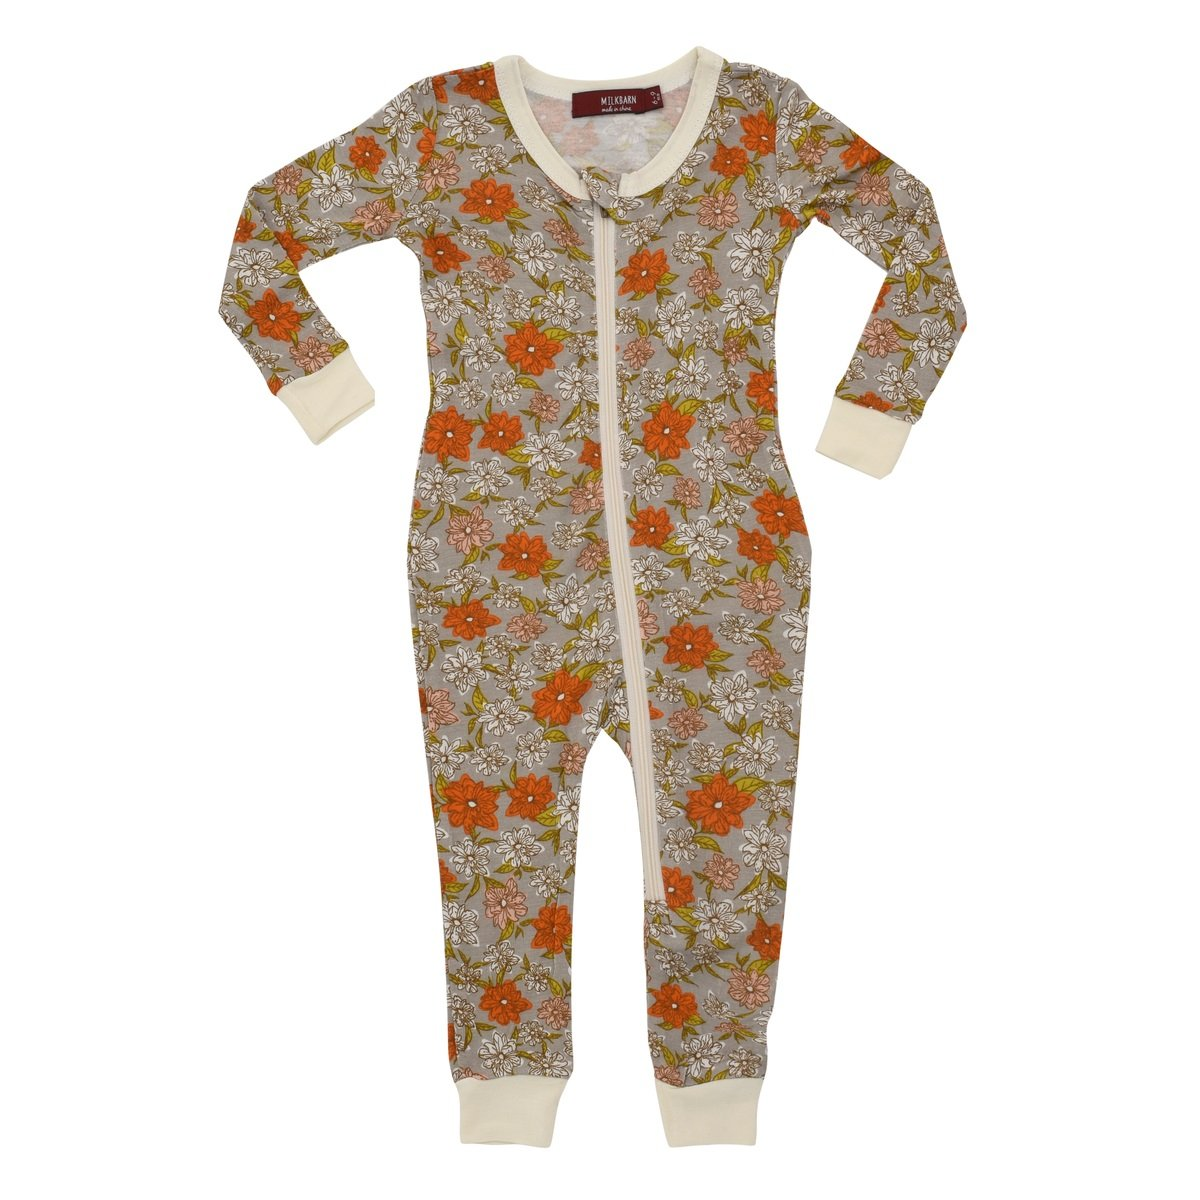 MilkBarn Bamboo Zipper Pajama - Grey Floral (12-18 Months) by MilkBarn